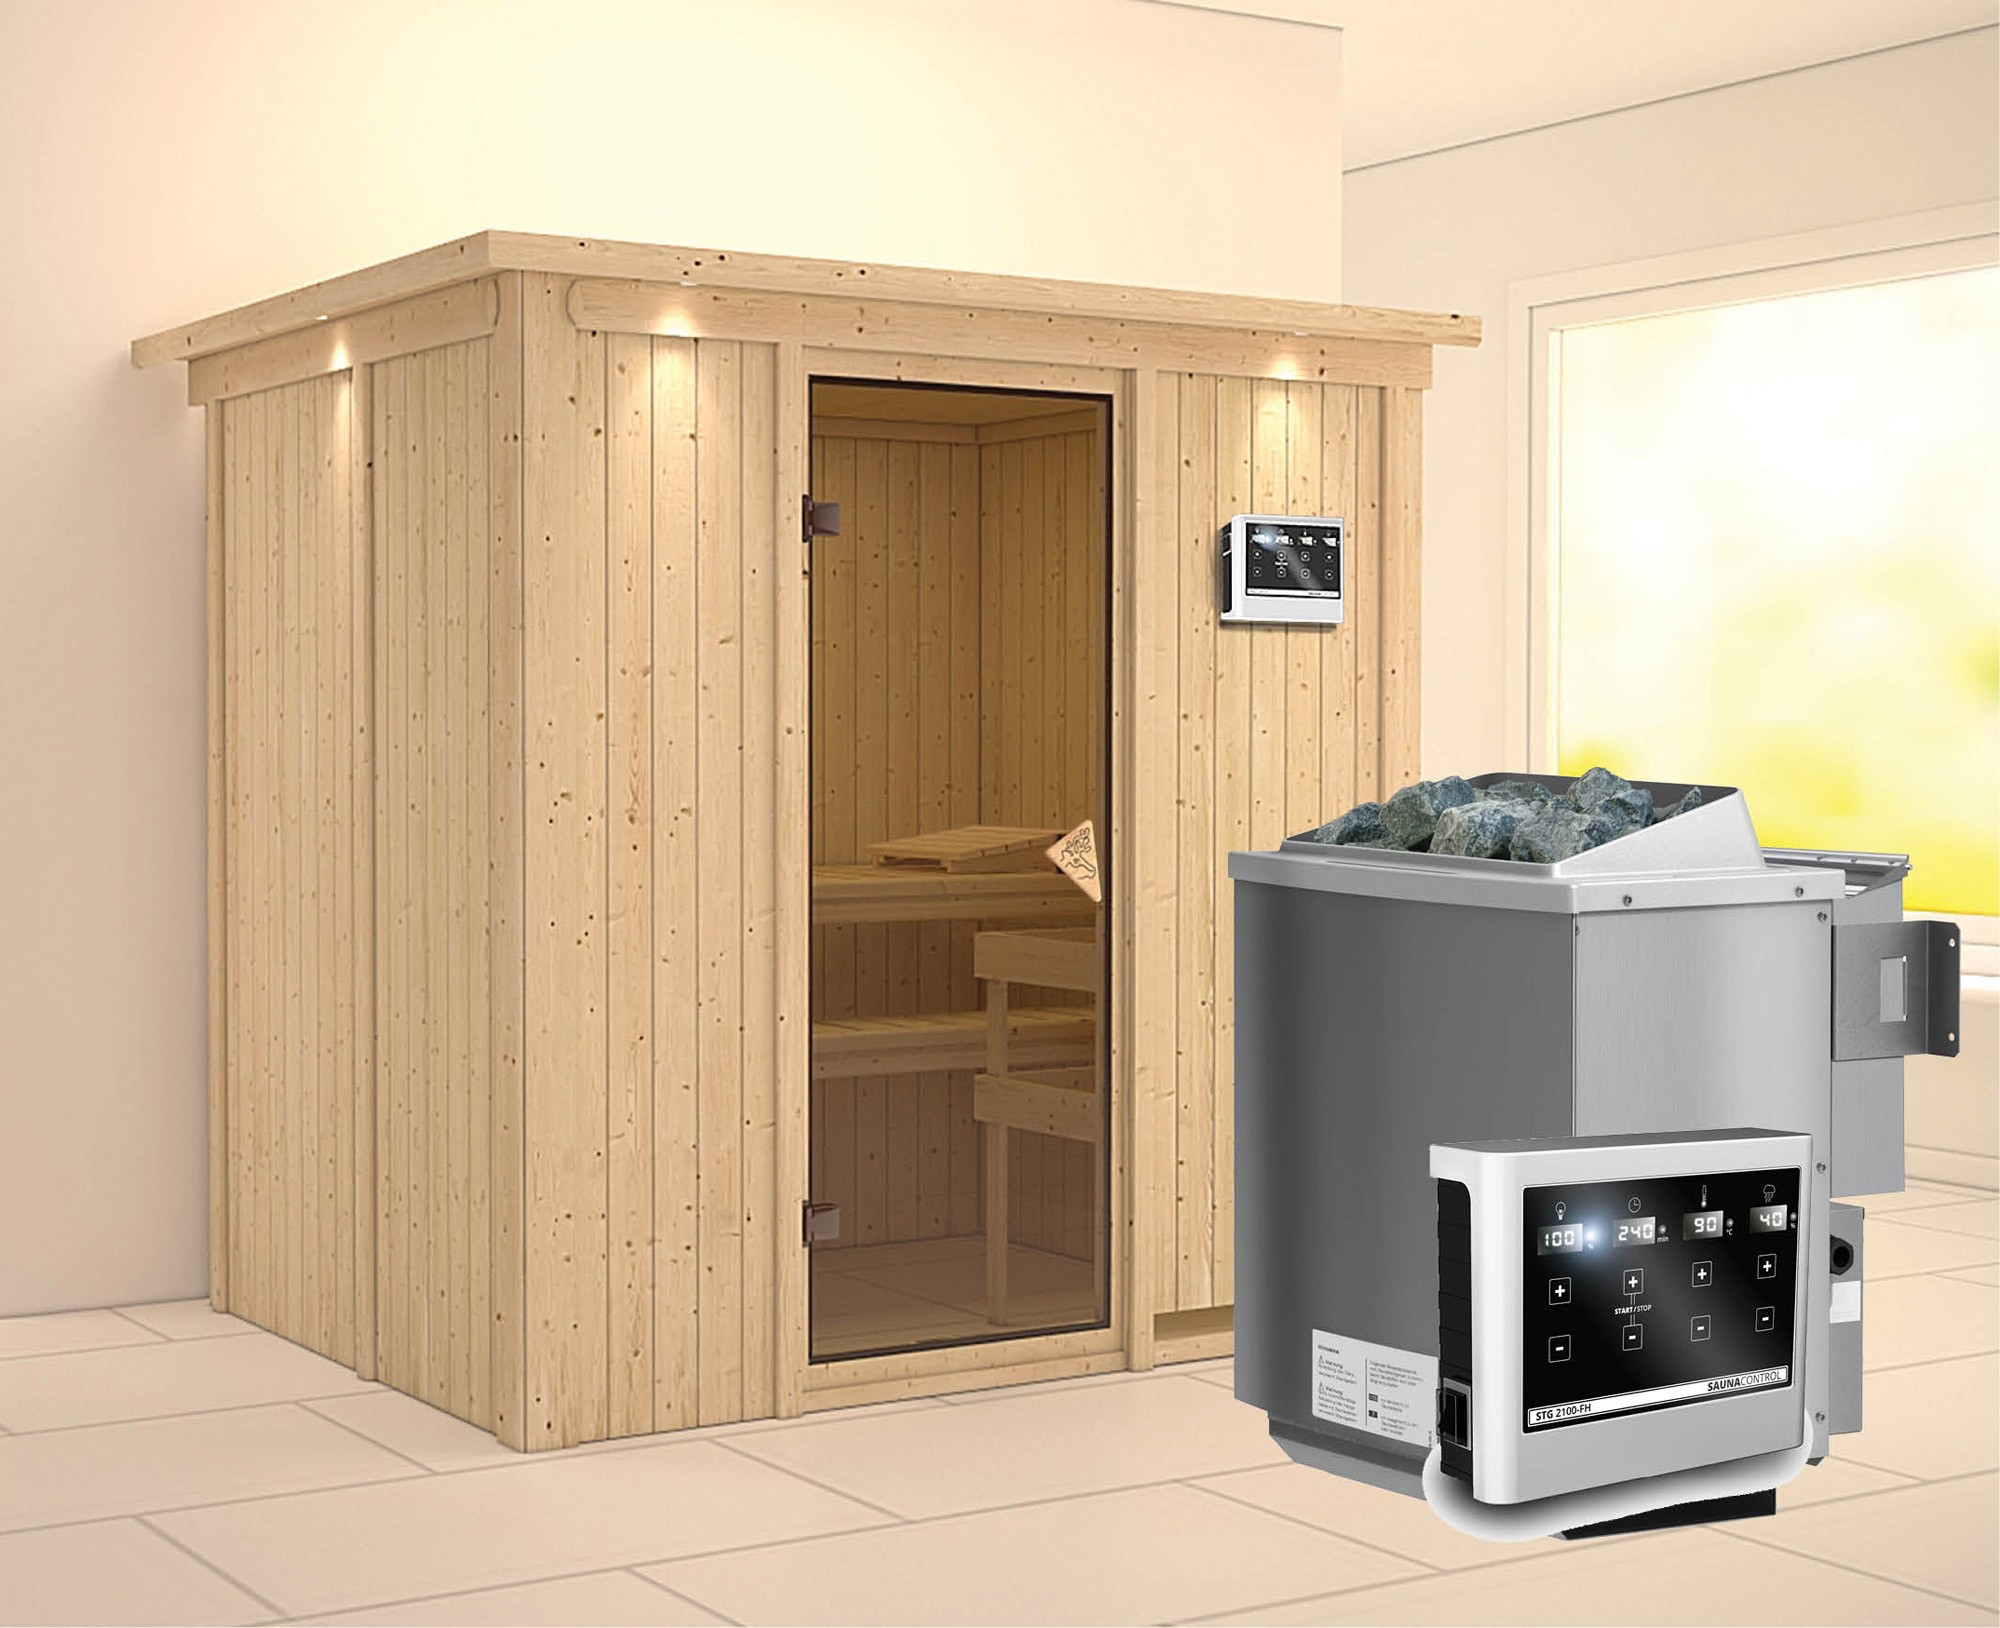 Karibu Sauna Bodin 68mm Dachkranz Bio Saunaofen 9kW extern classic Tür Bild 1